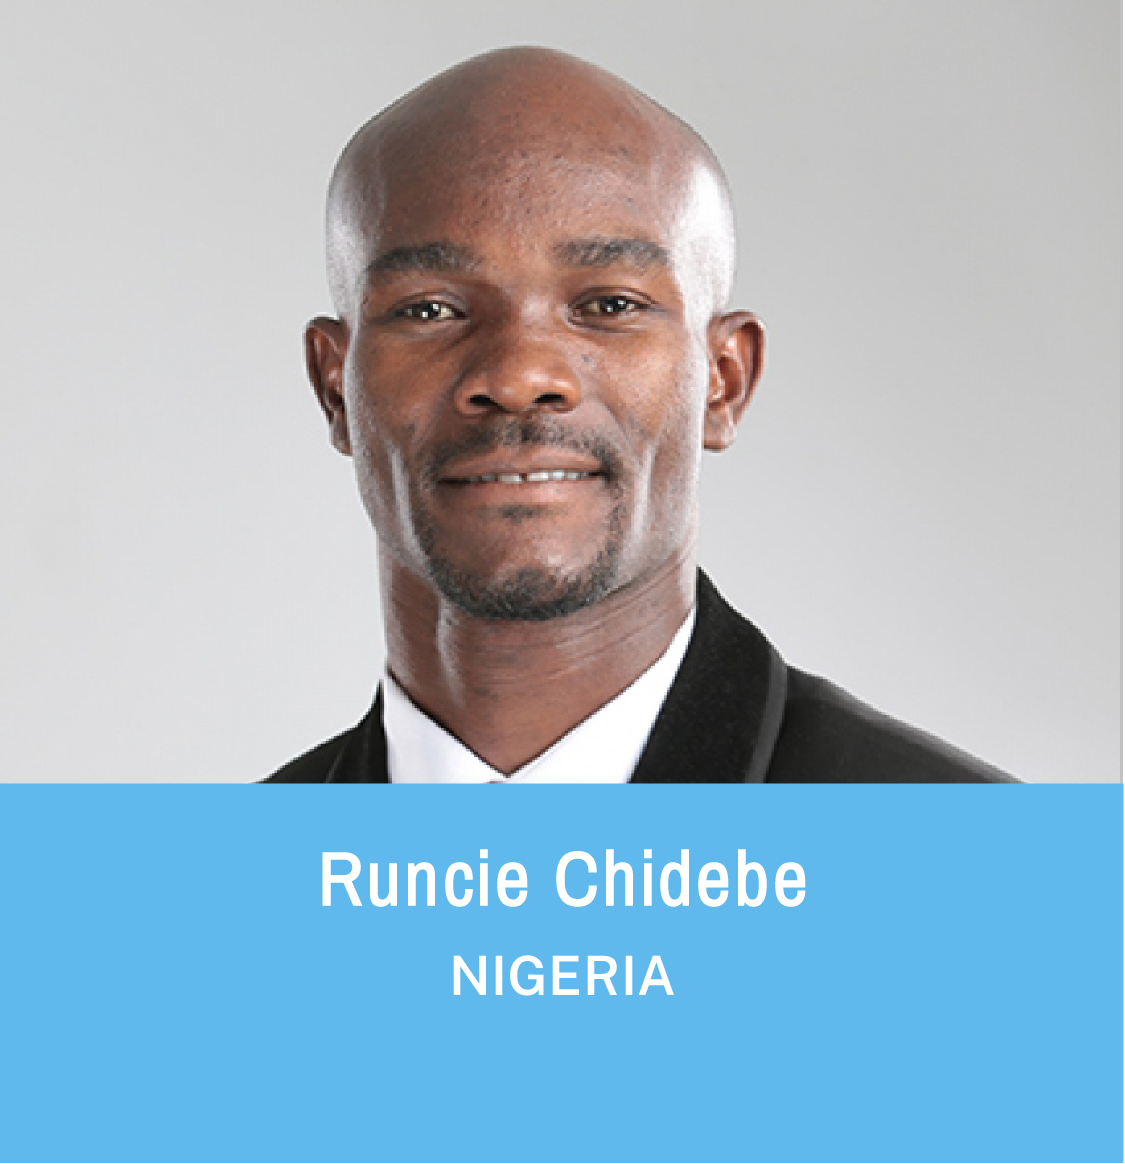 Runcie Chidebe, Global Health Innovator